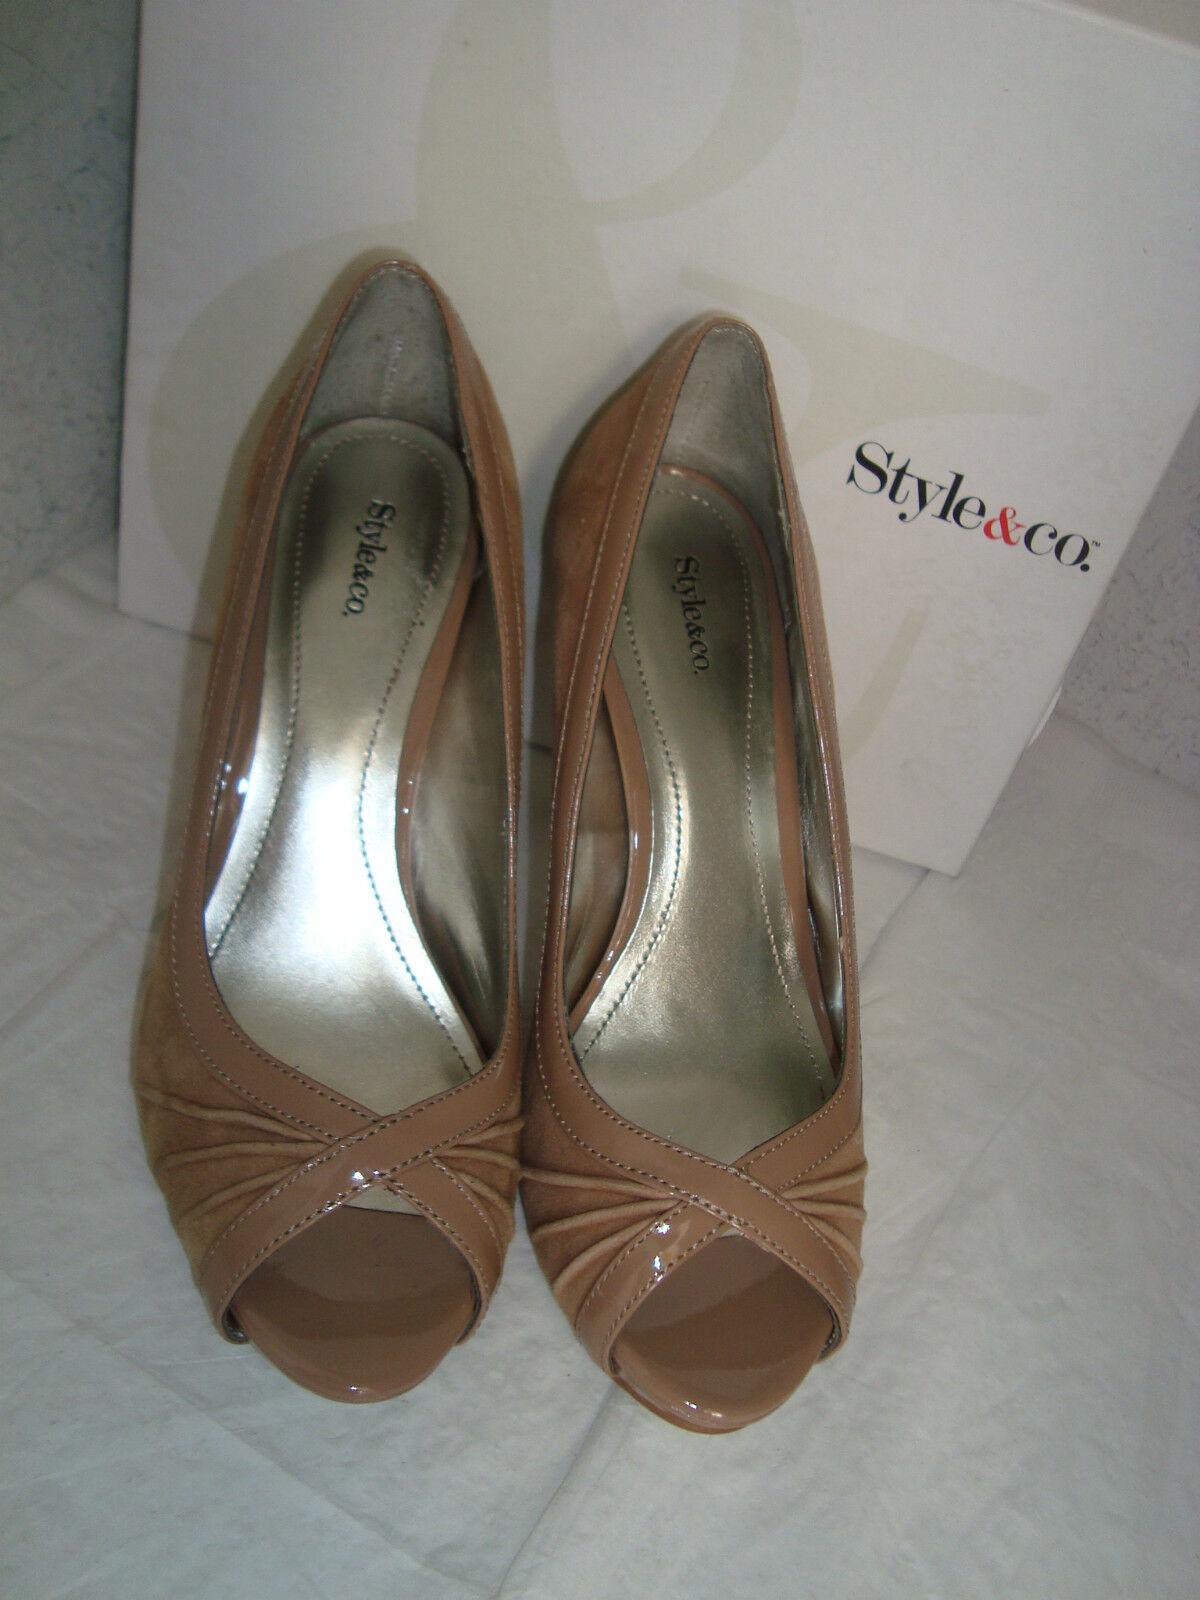 Style & Co Damenschuhe Spicey Clay Open Toe Heels Schuhes Beige 6 Medium Display Model